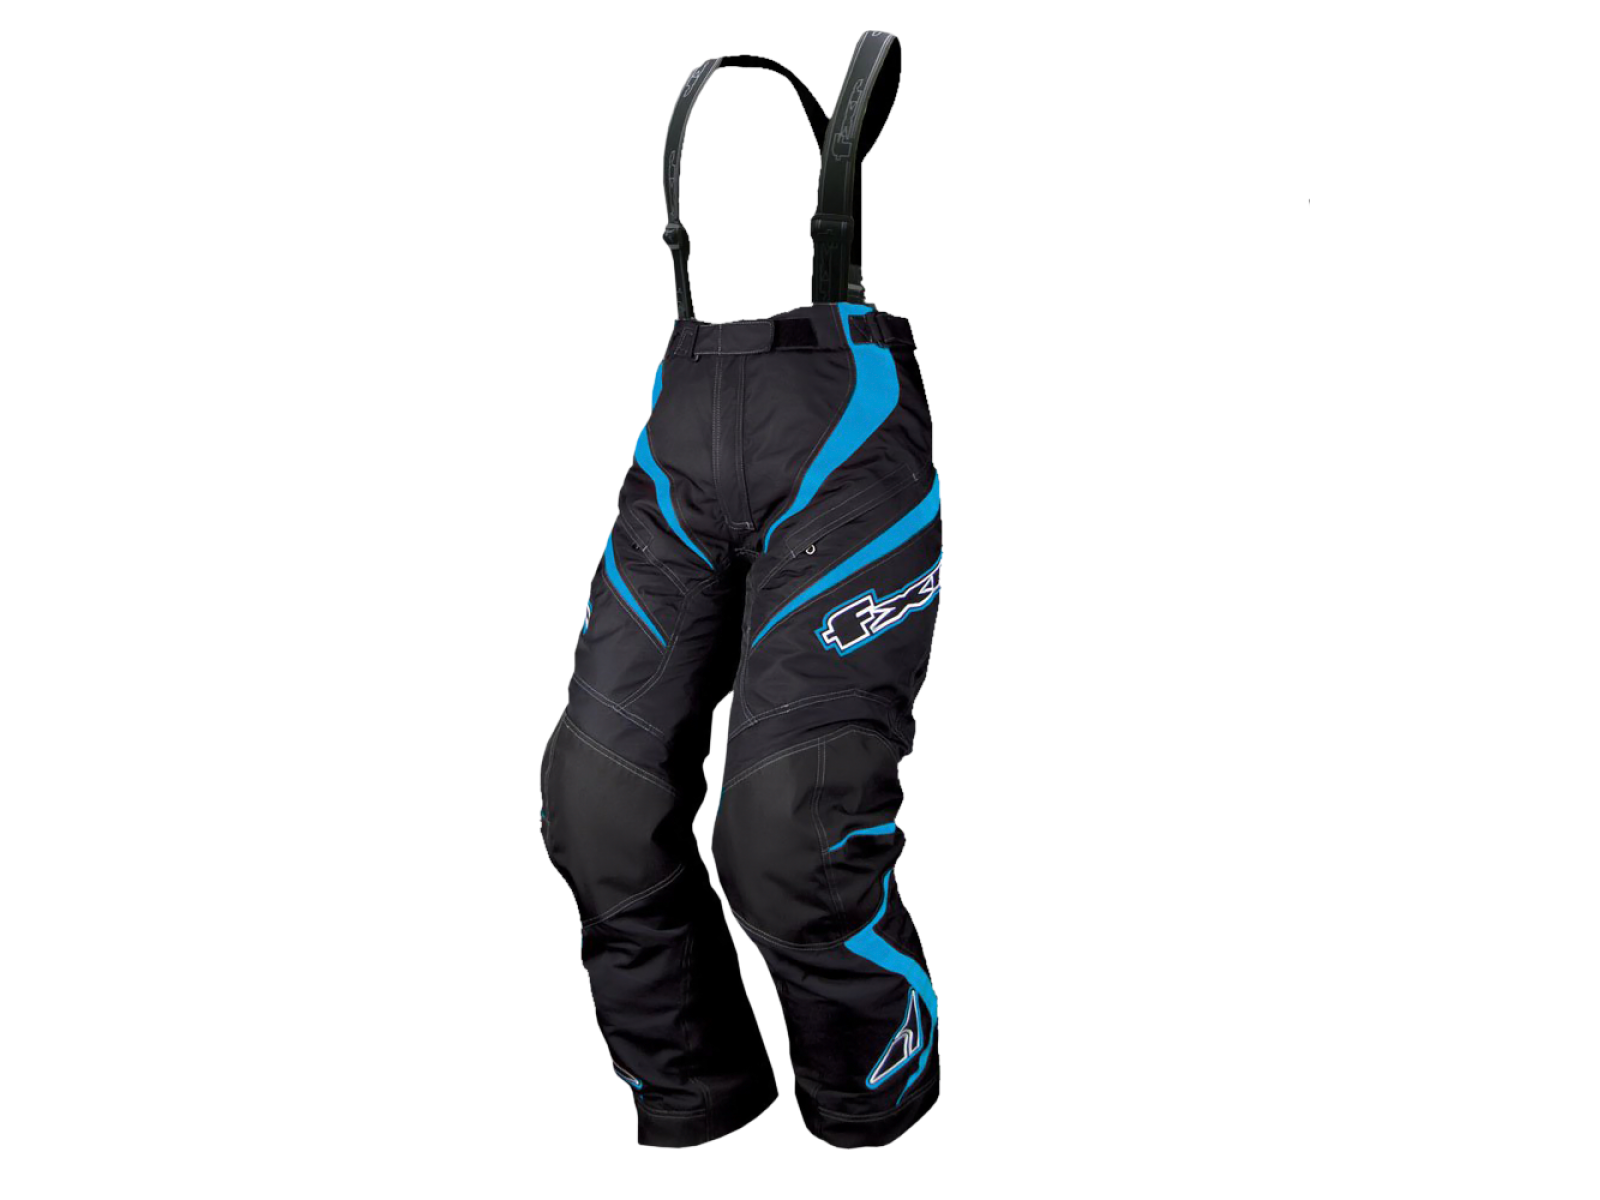 Снегоходные брюки женские FXR NITRO GIRL WOMEN Black/Cyan